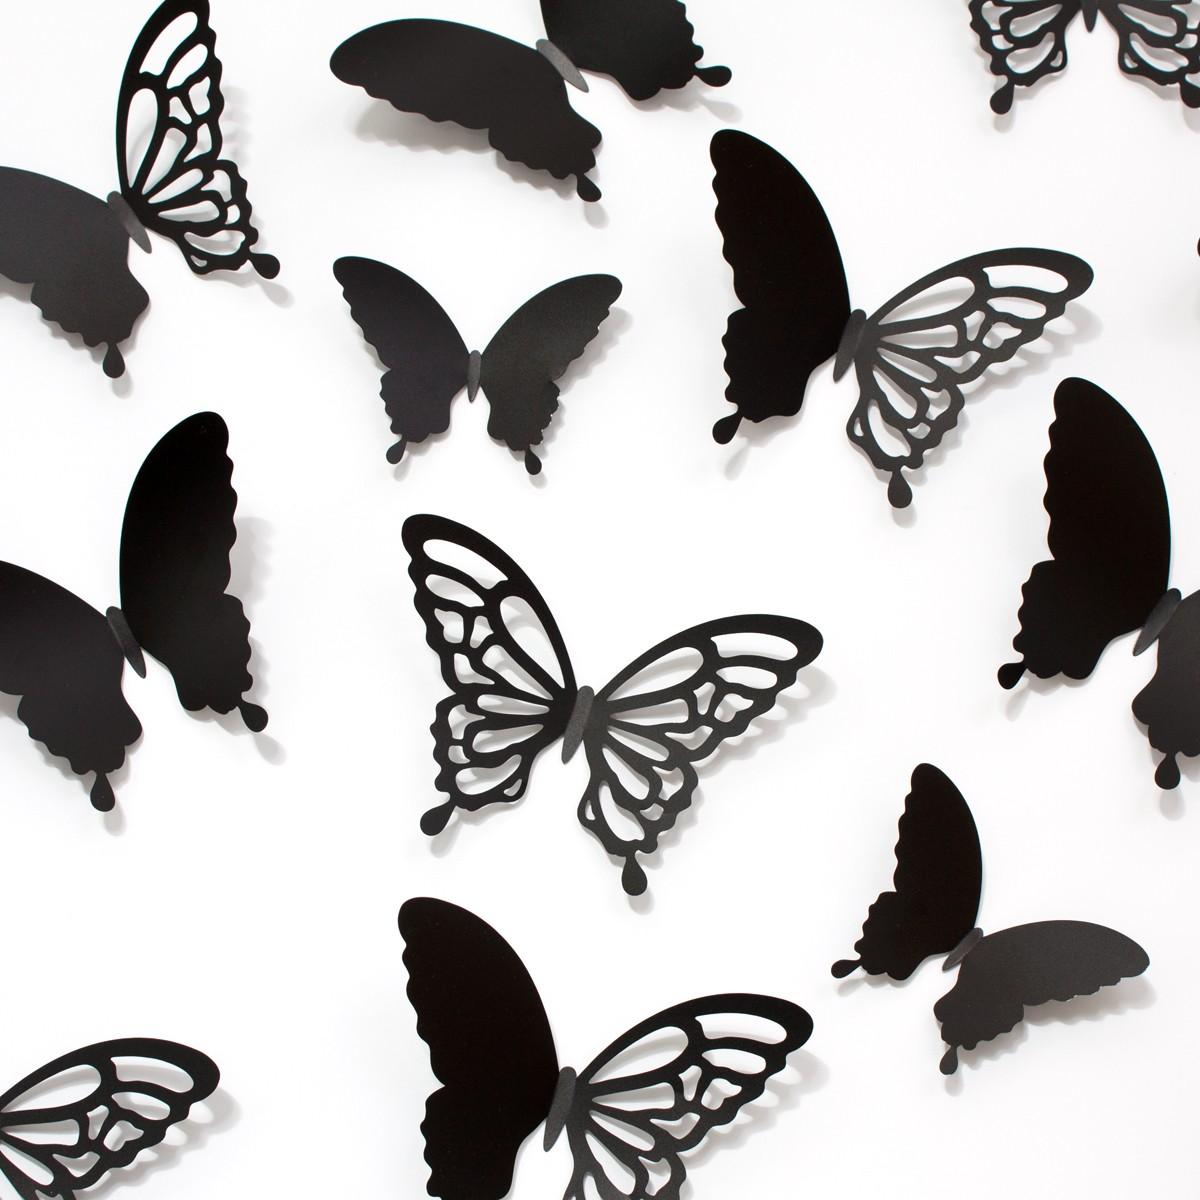 Wandtattoo 3D Schmetterlinge schwarz mit Ornamenten Muster